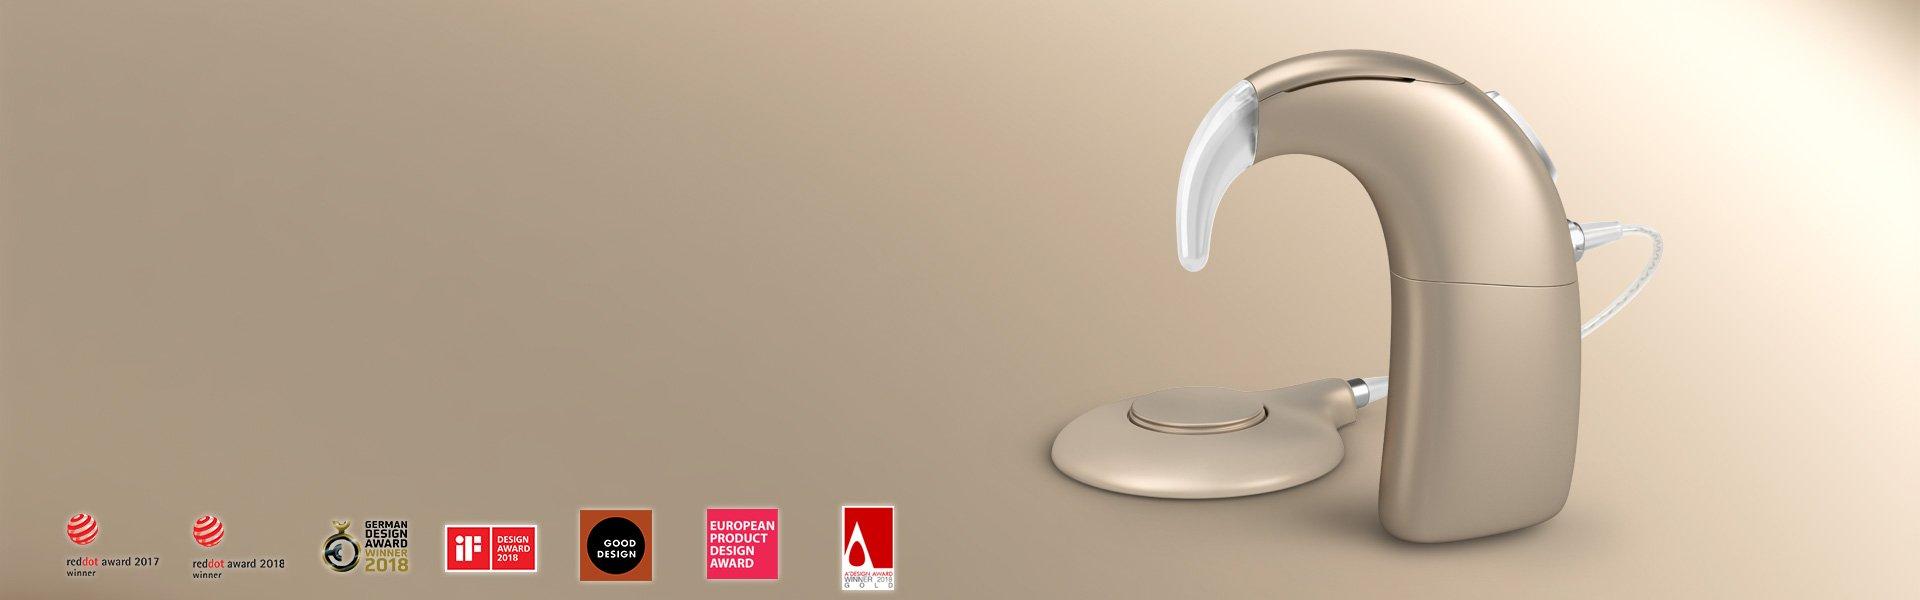 Neuro 2 - award winning design